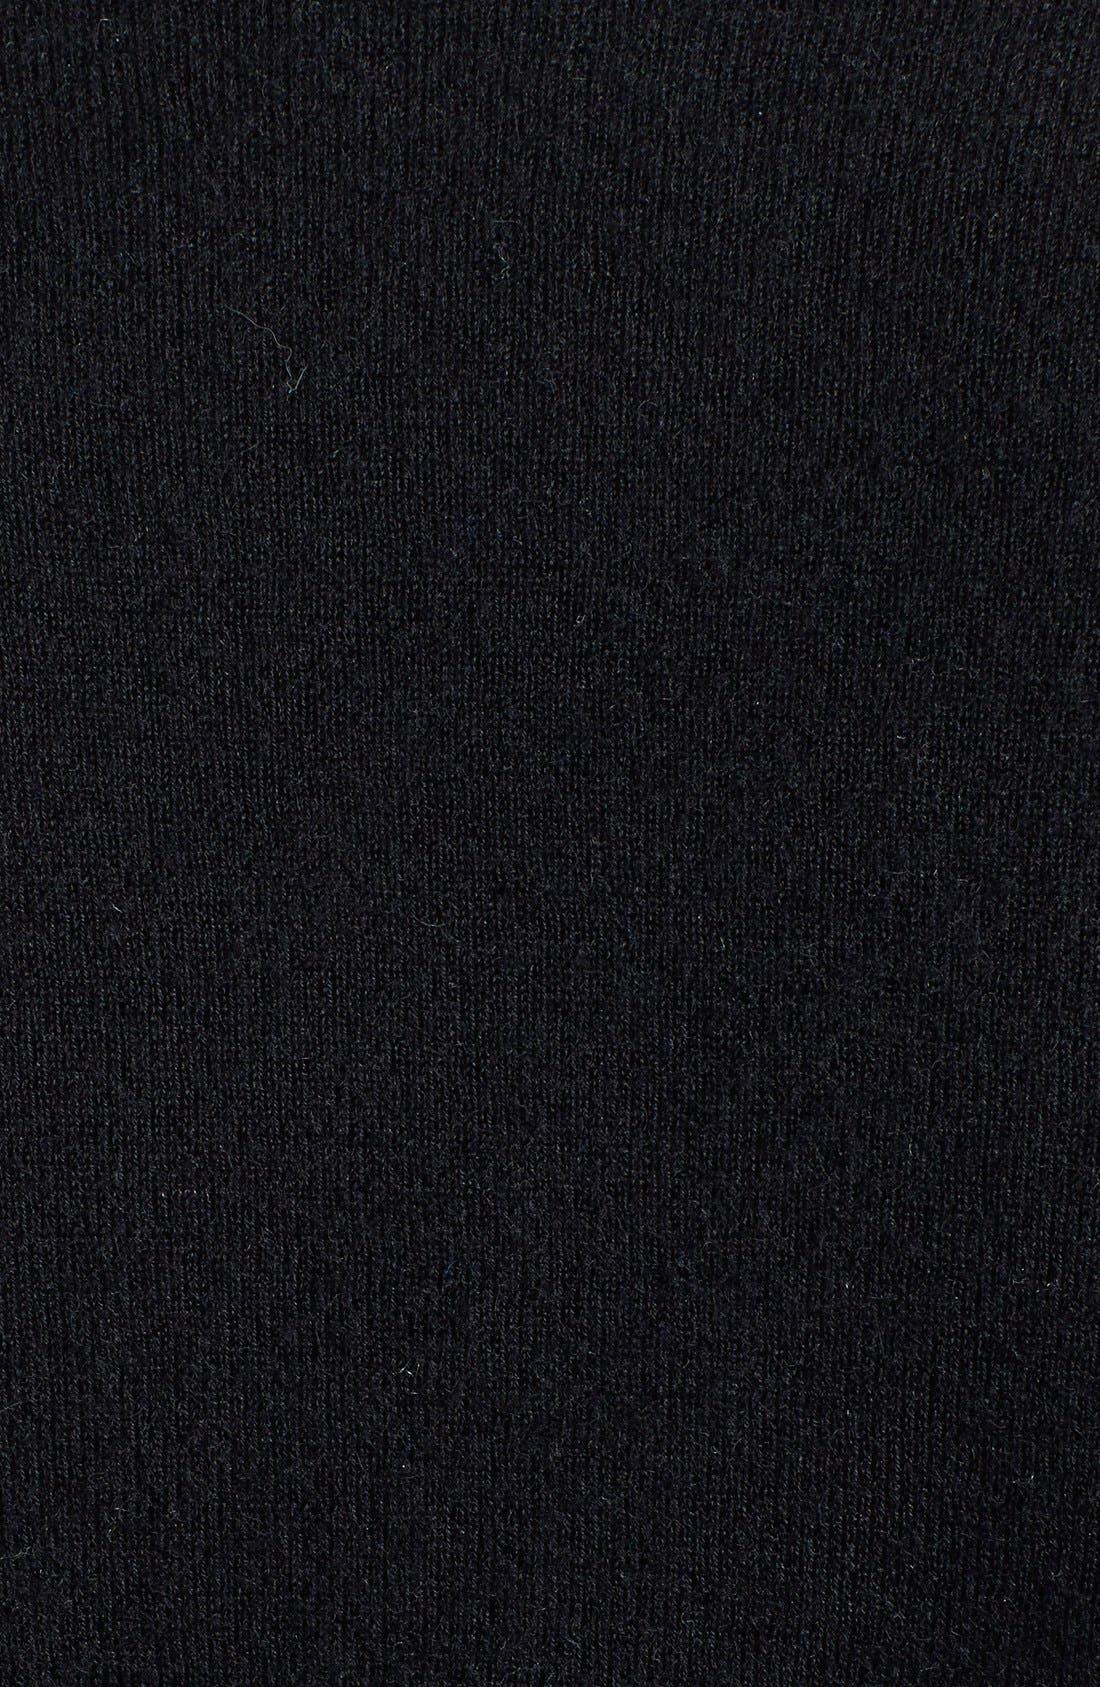 Deep V-Neck Cashmere Sweater,                             Alternate thumbnail 3, color,                             001